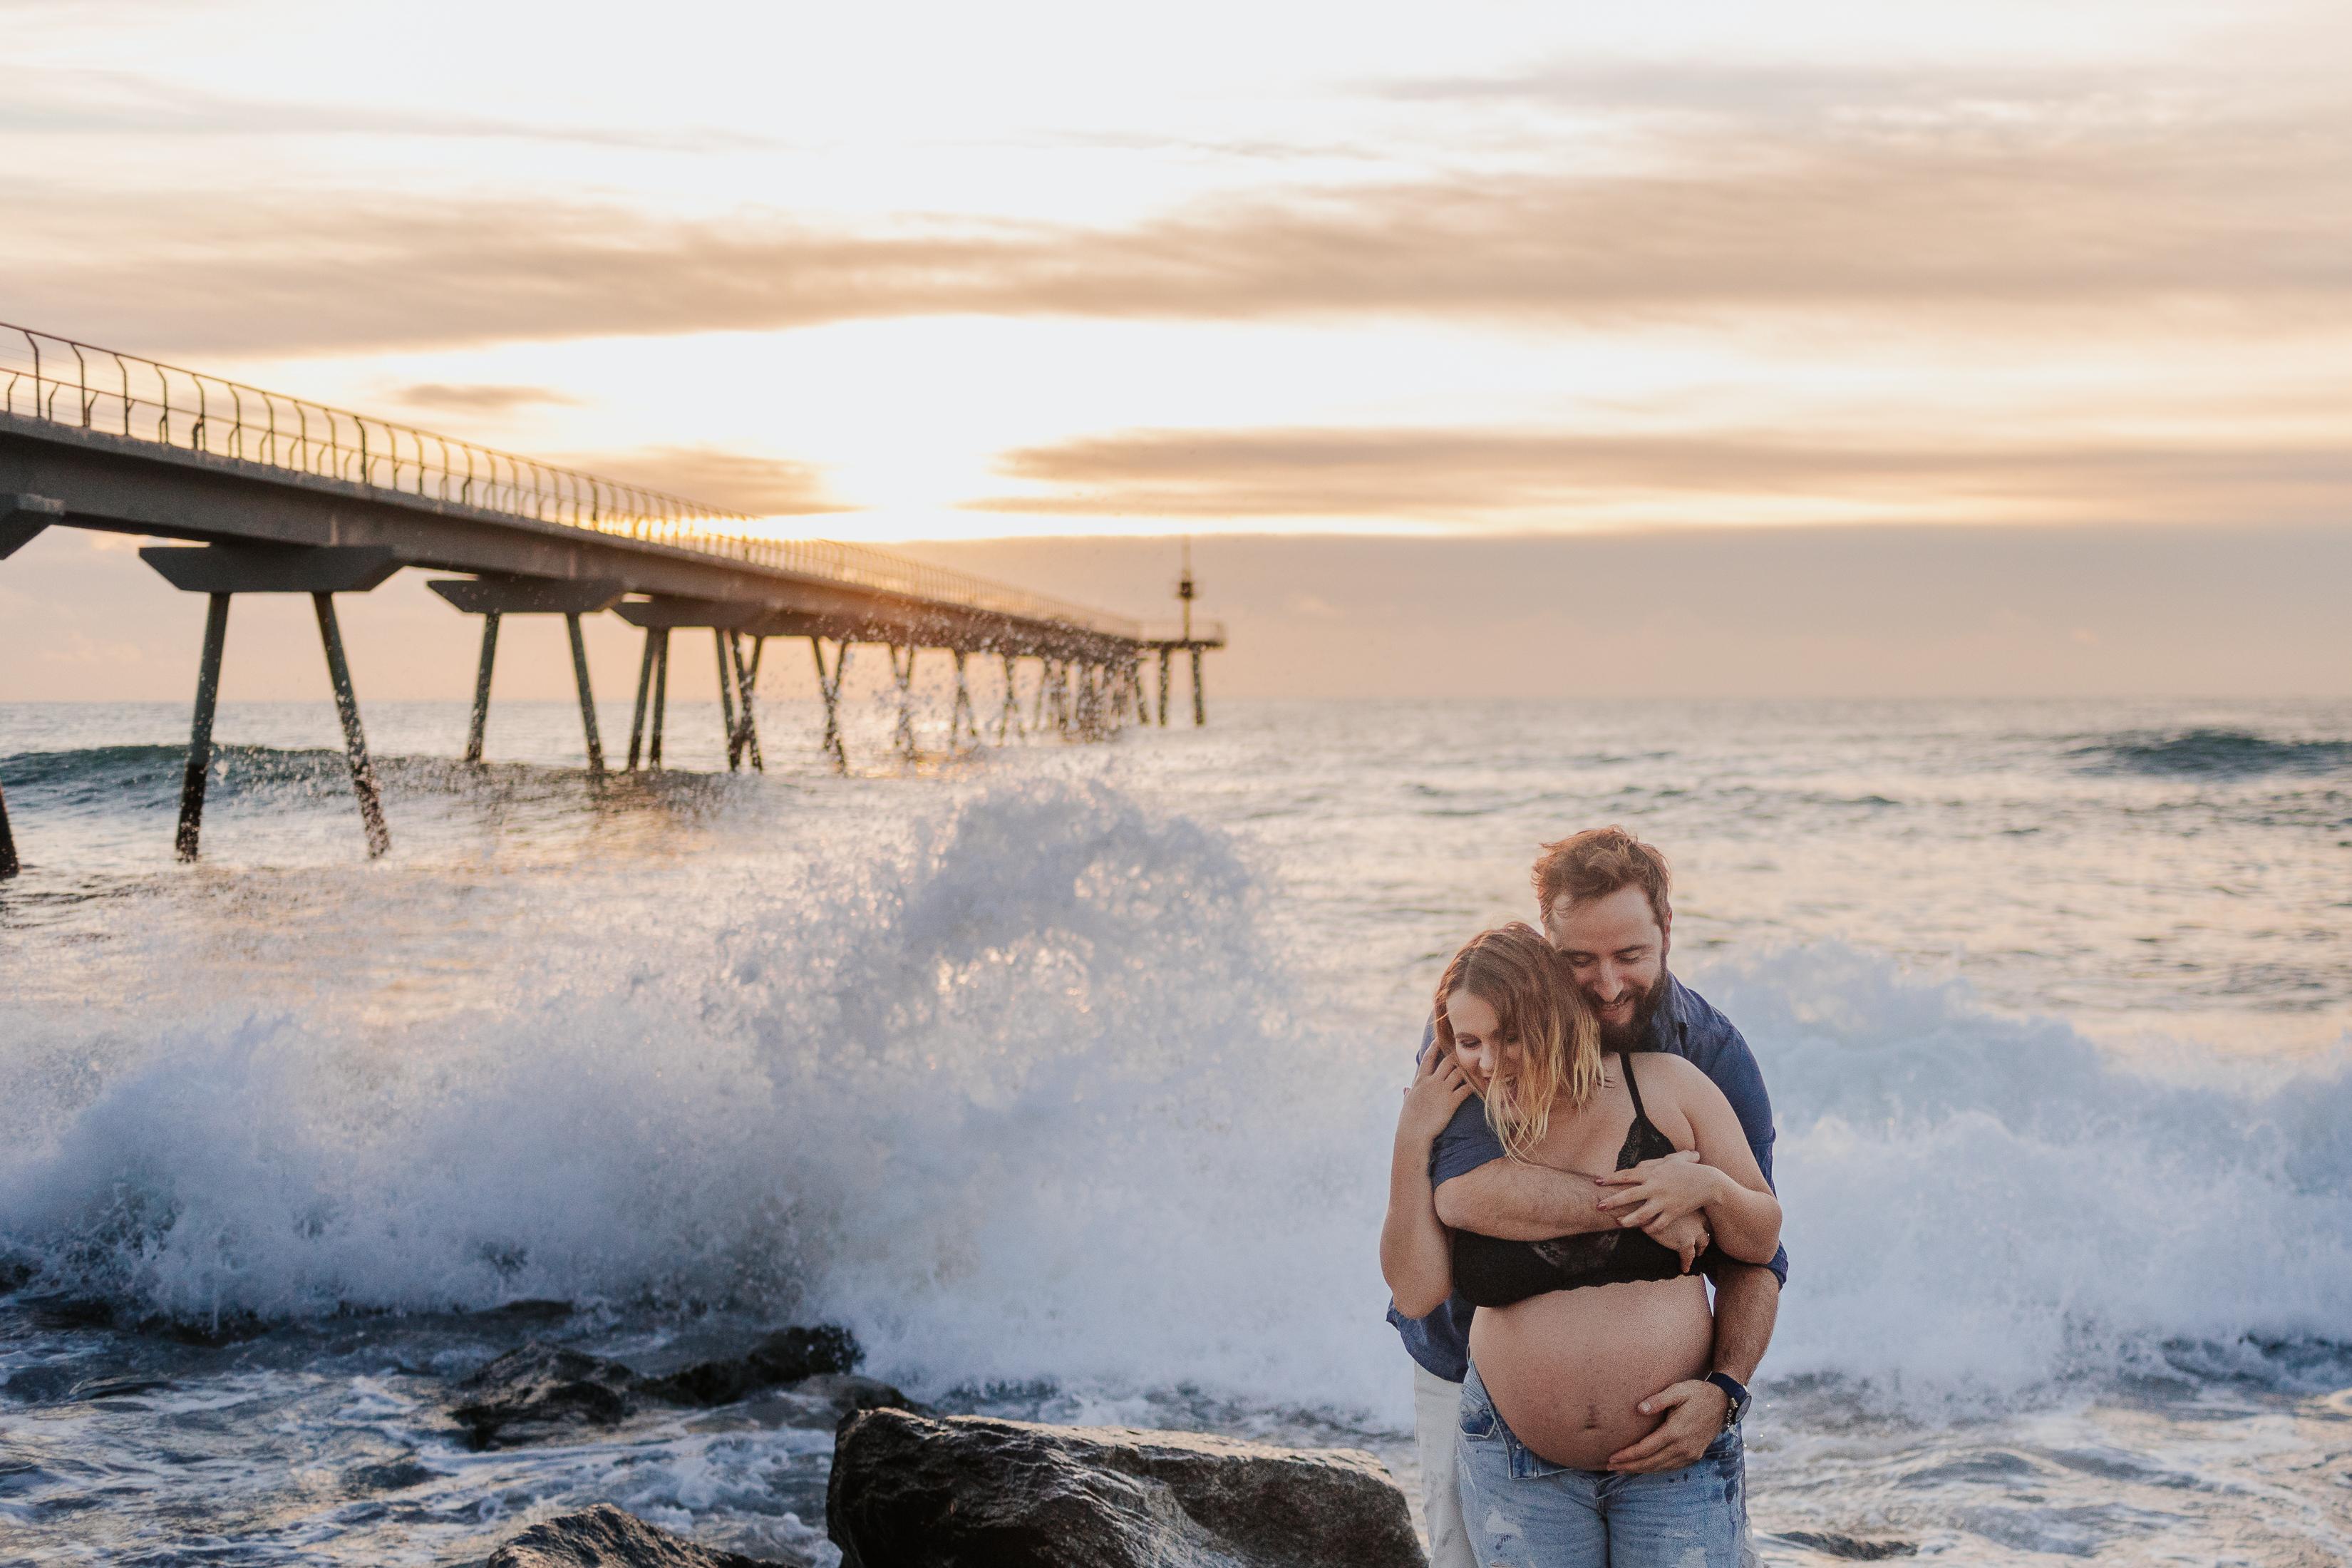 Fotógrafo embarazo Badalona :: Fotógrafo embarazada Badalona :: Pont del petroli :: Amanecer :: Salida del sol :: Pareja embarazada